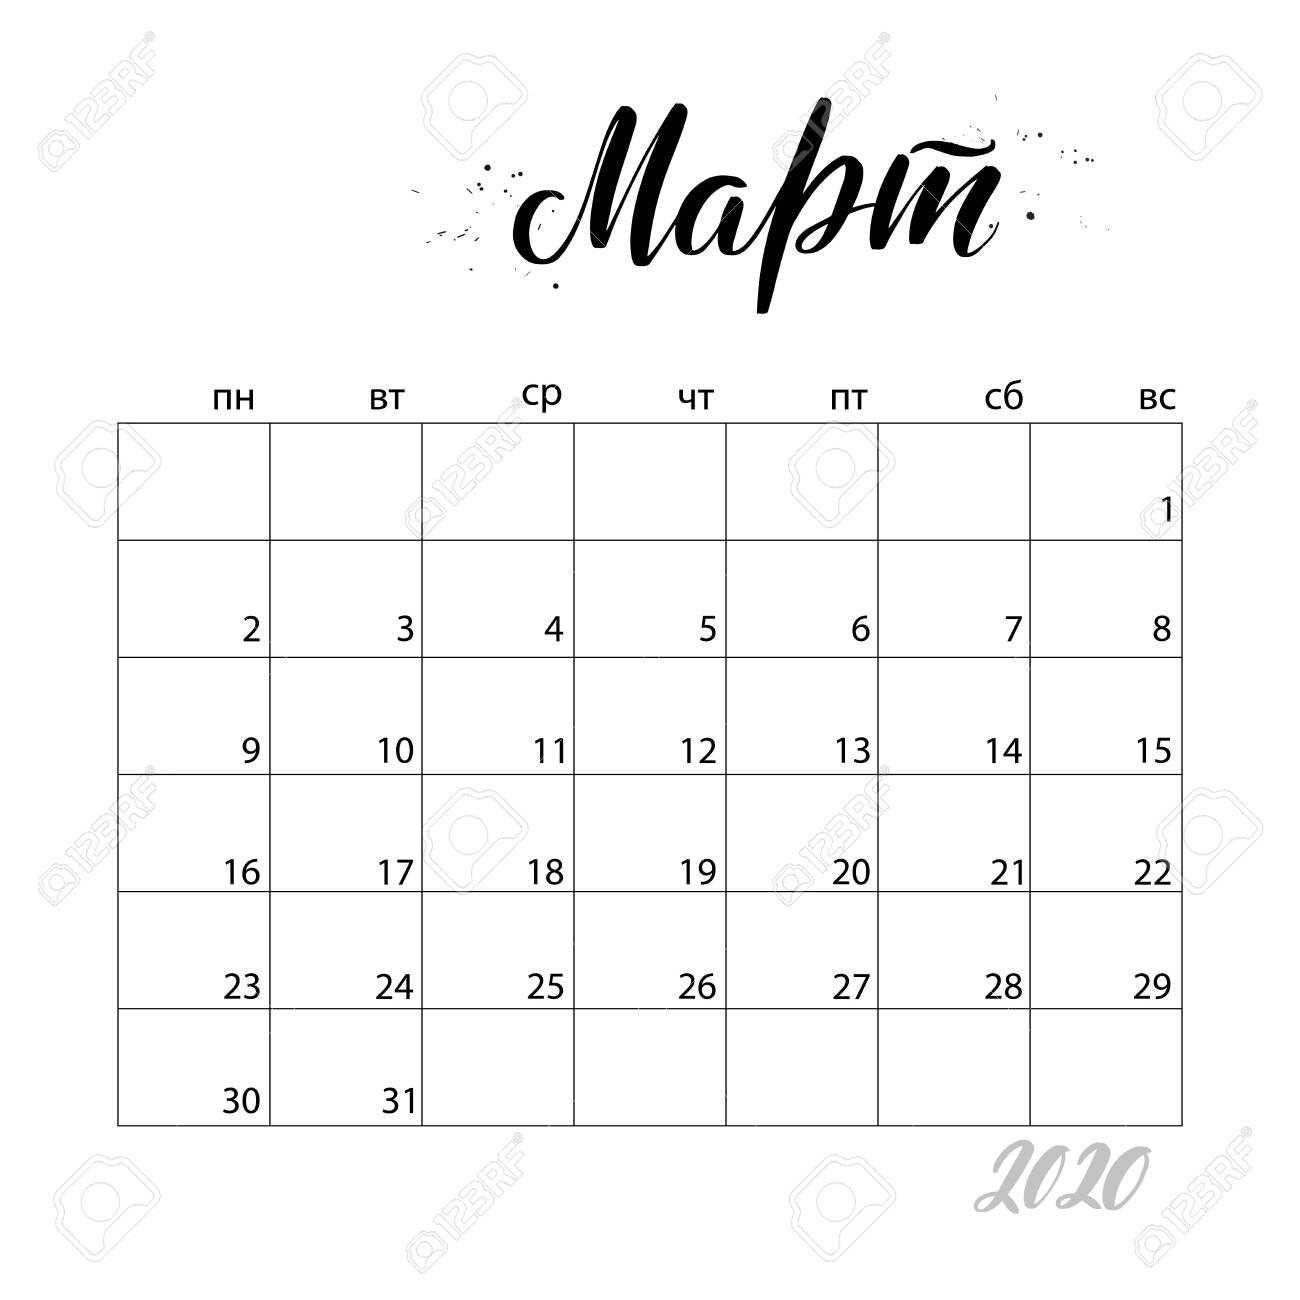 March. Monthly Calendar For 2020 Year. Handwritten Modern Calligraphy..